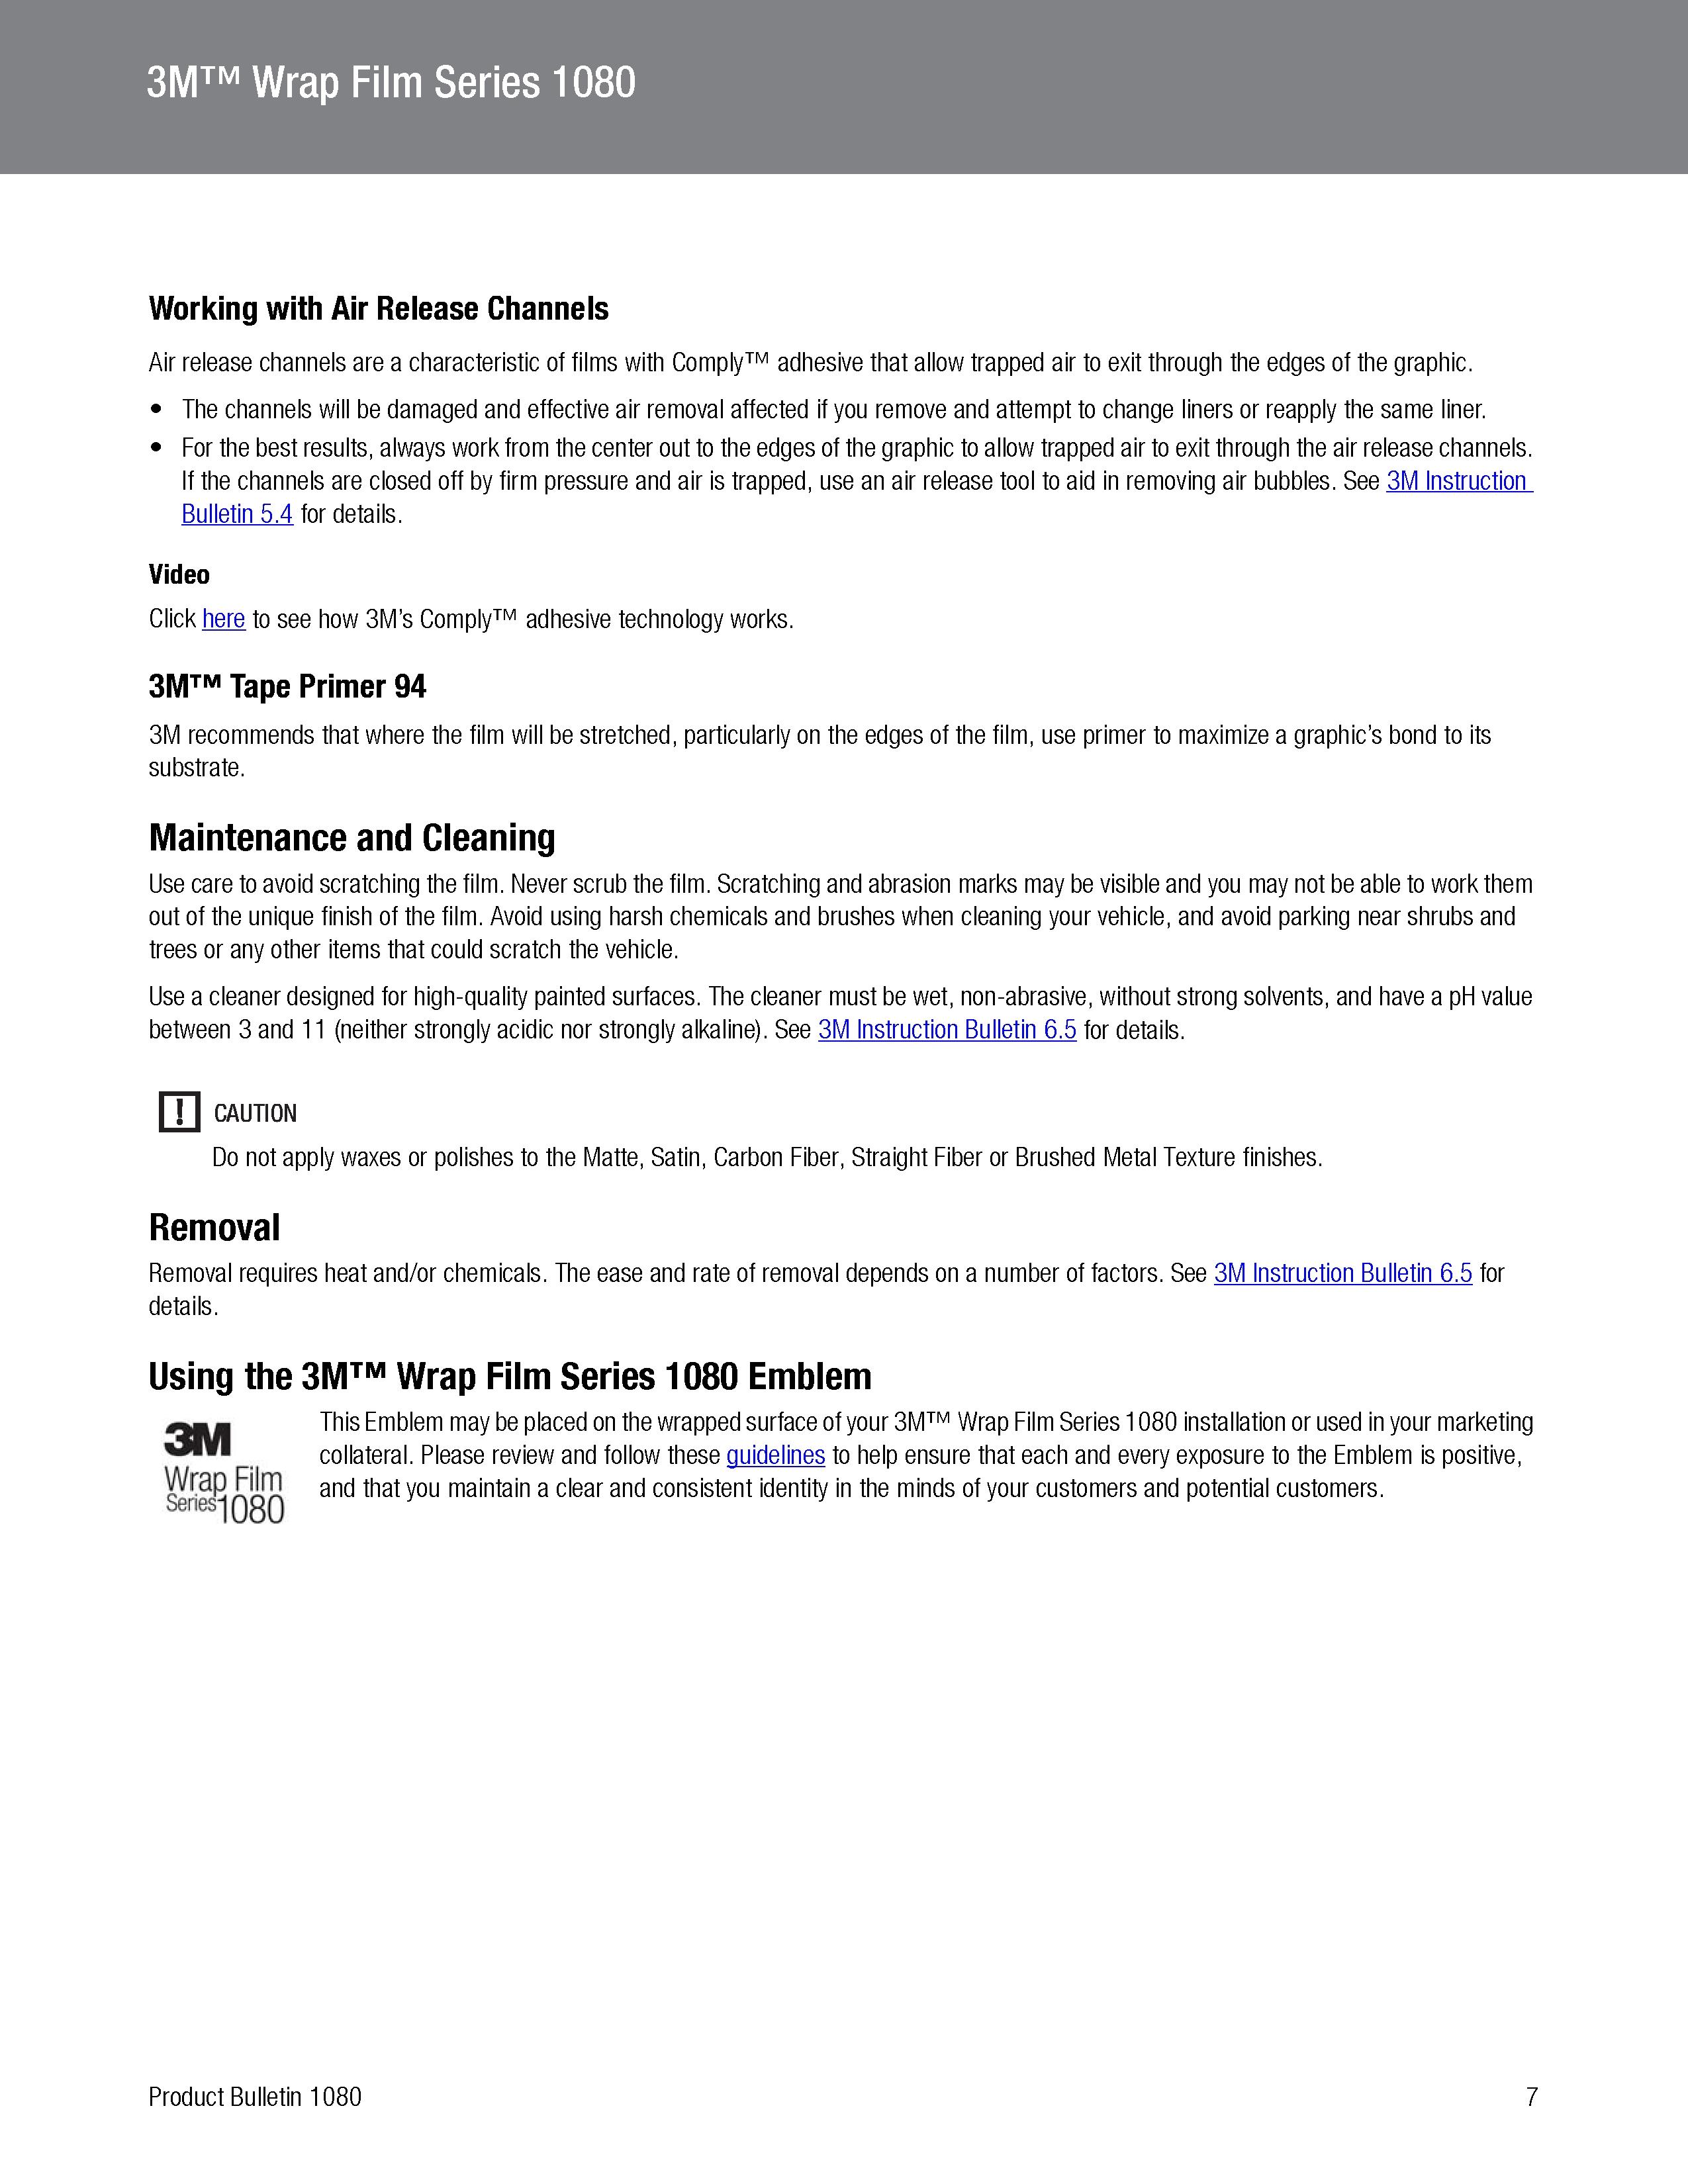 multimedia_7.jpg